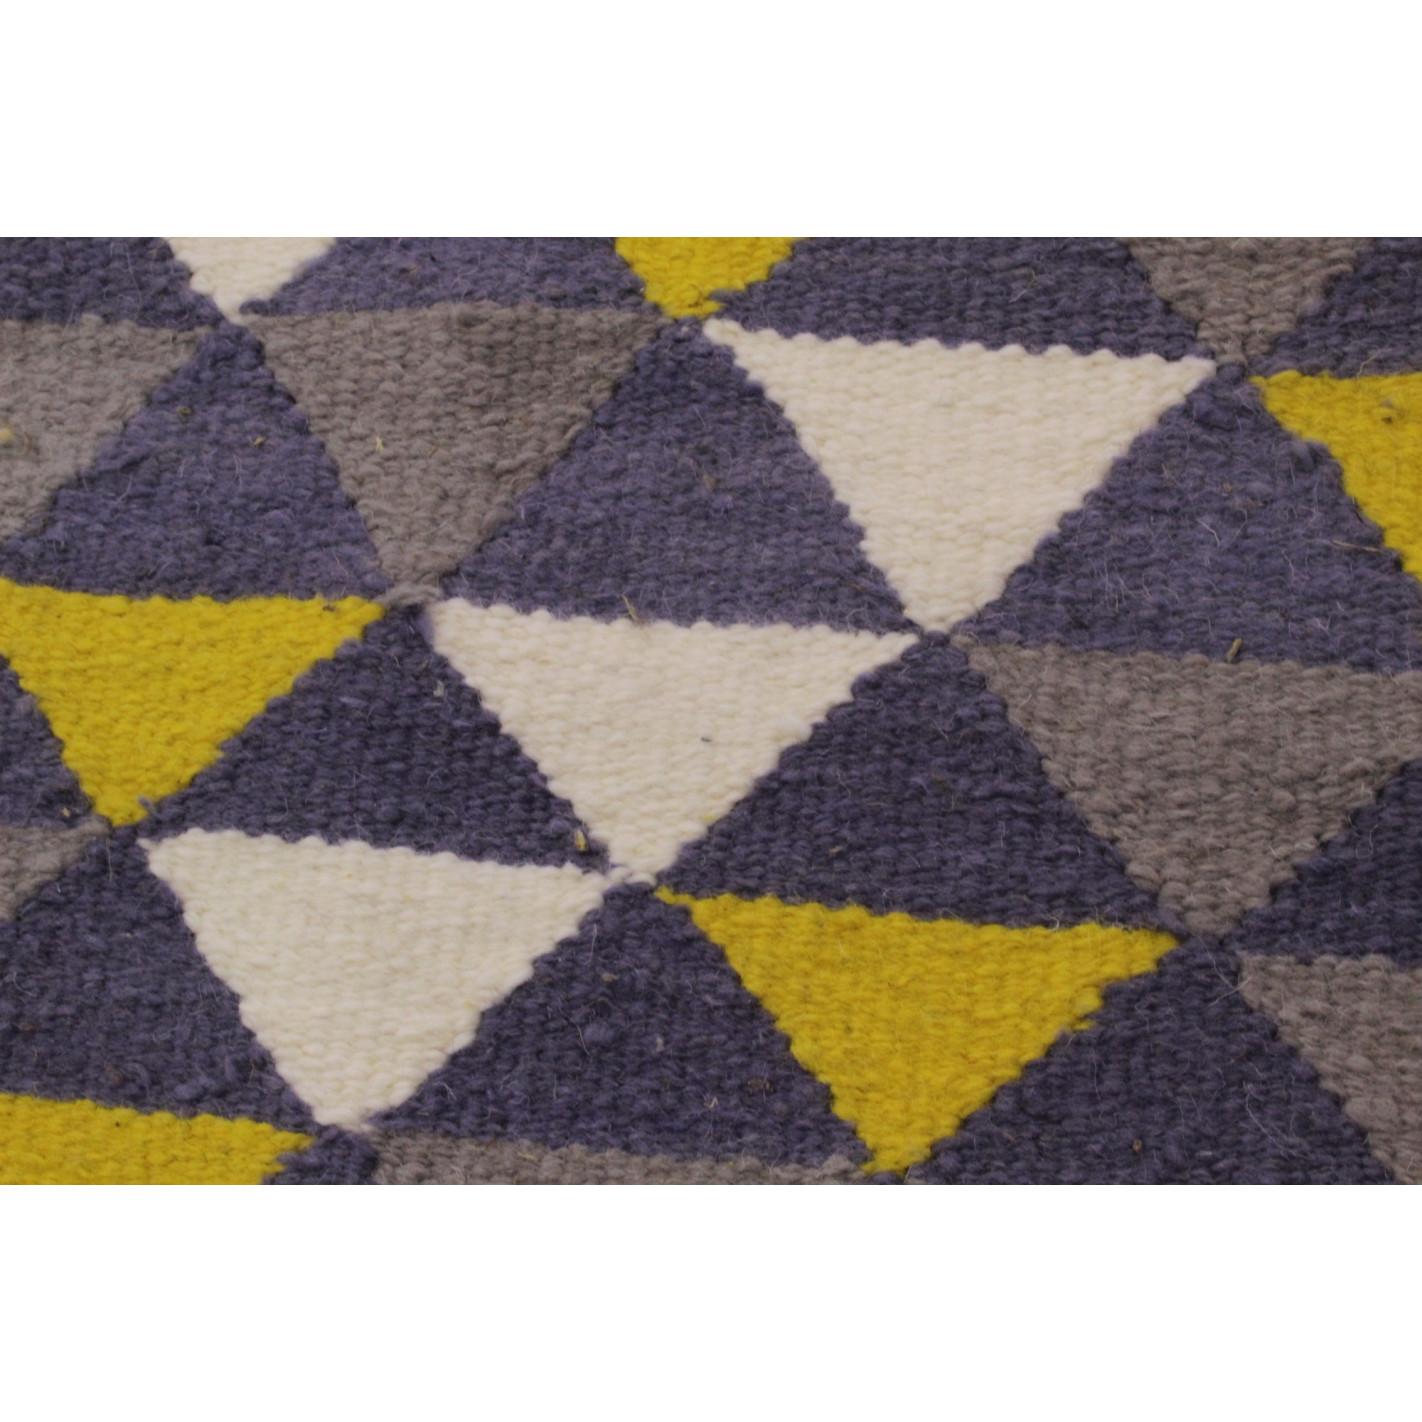 tapis scandinave motifs triangles gris et jaune. Black Bedroom Furniture Sets. Home Design Ideas